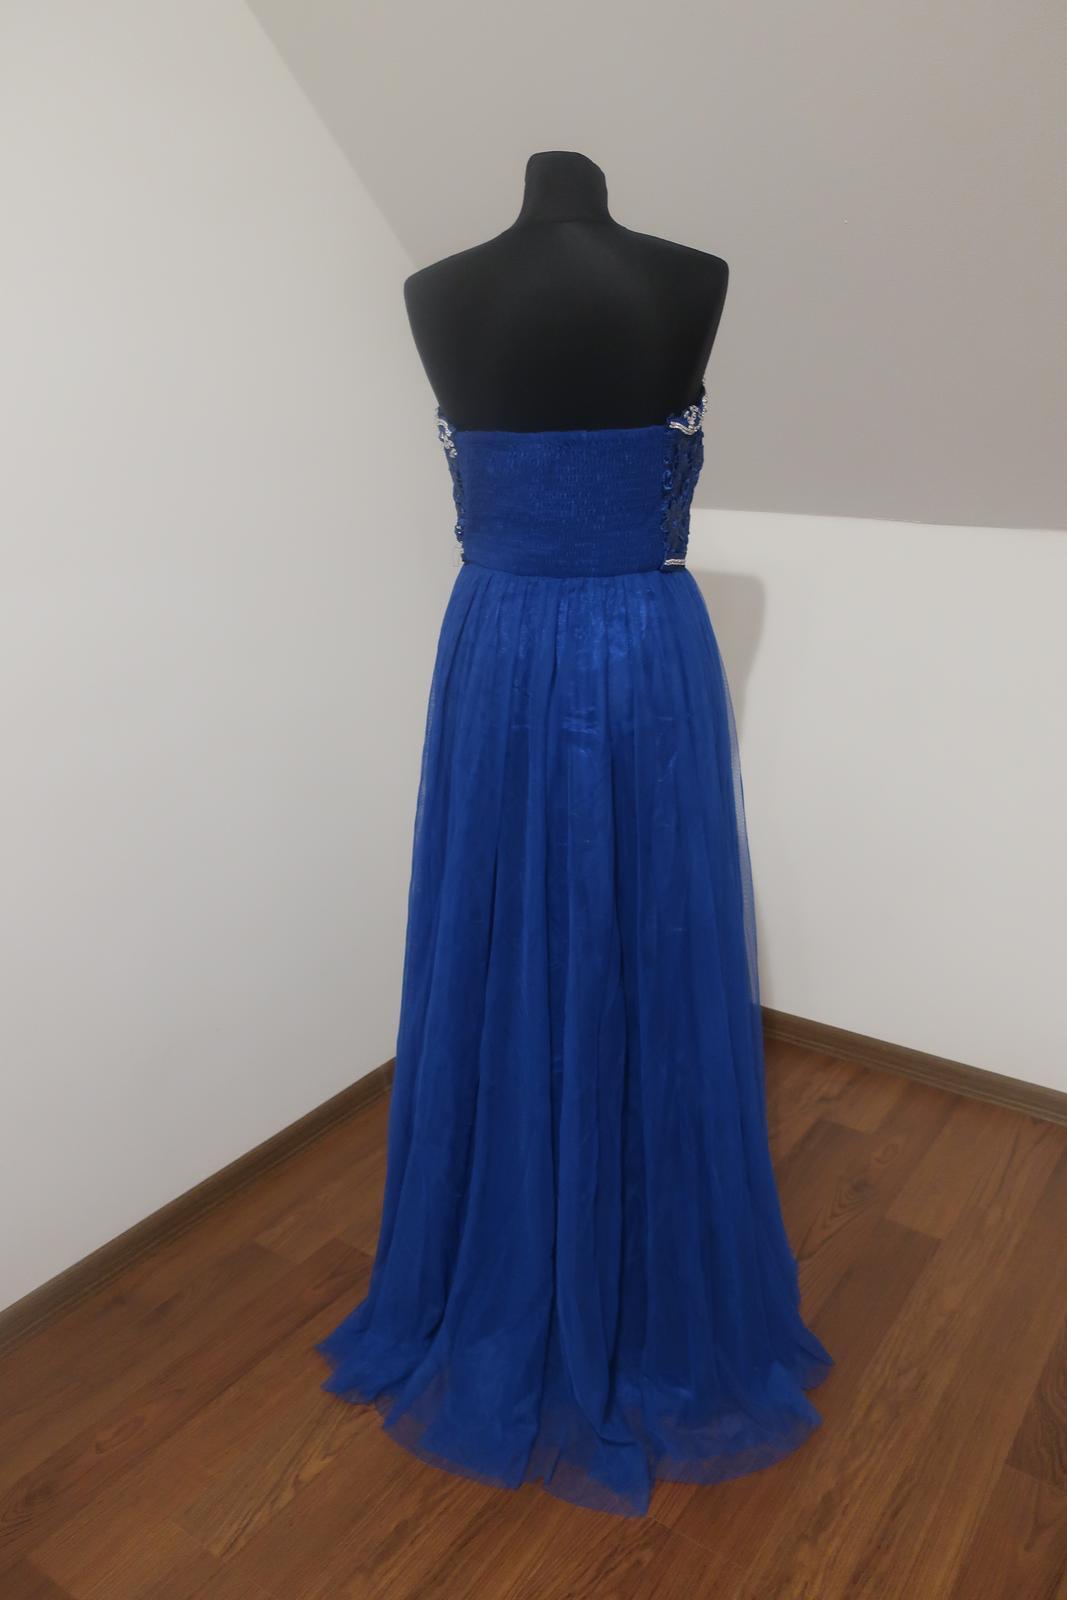 Dlhé modré šaty - Obrázok č. 3